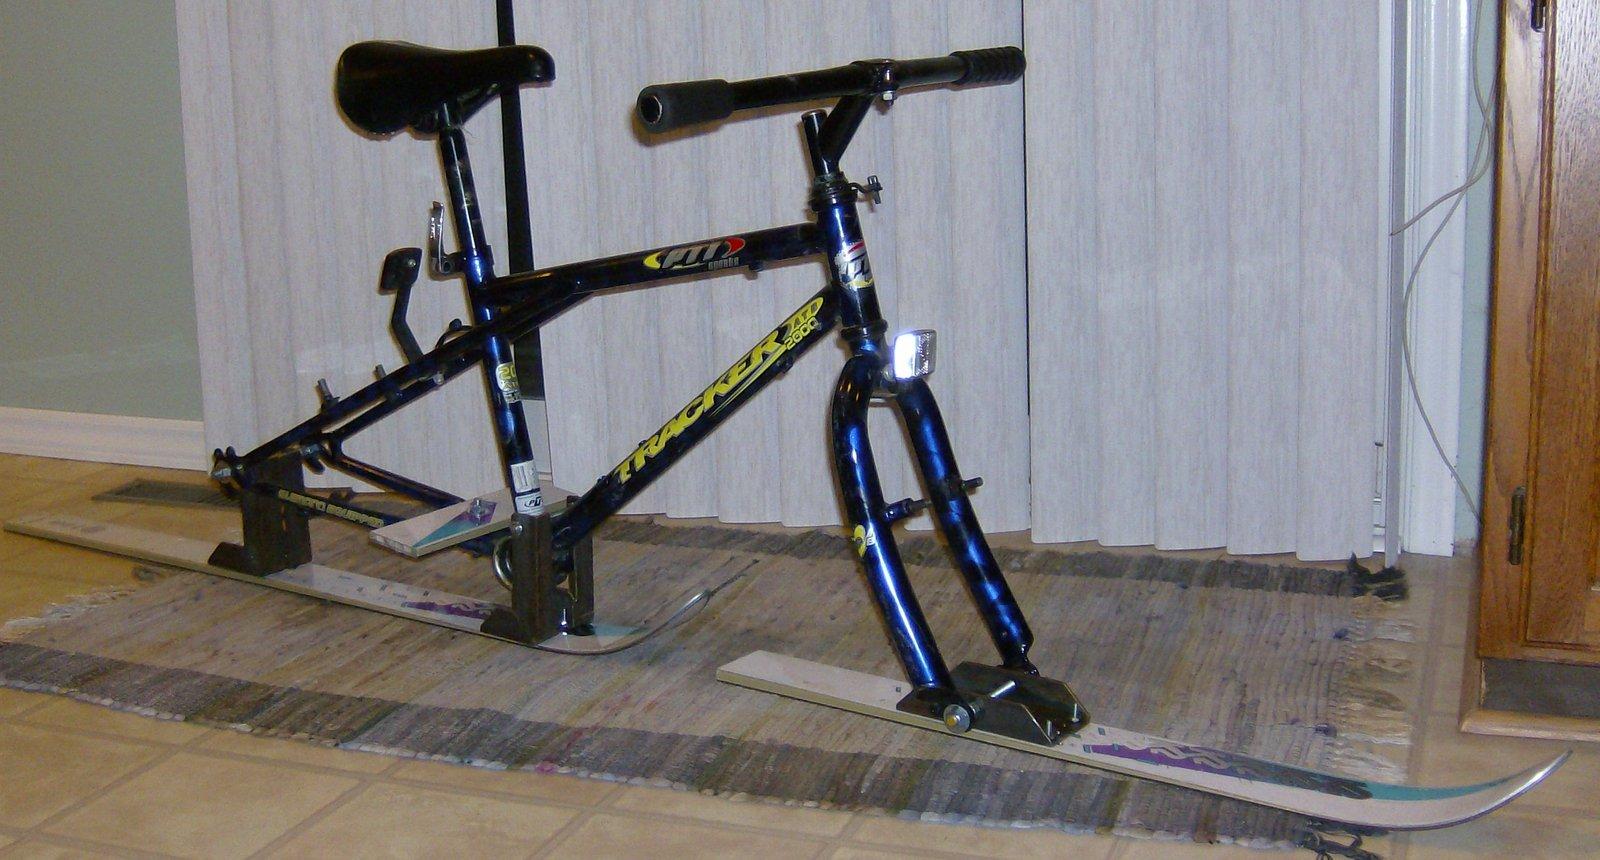 My Ski Bike